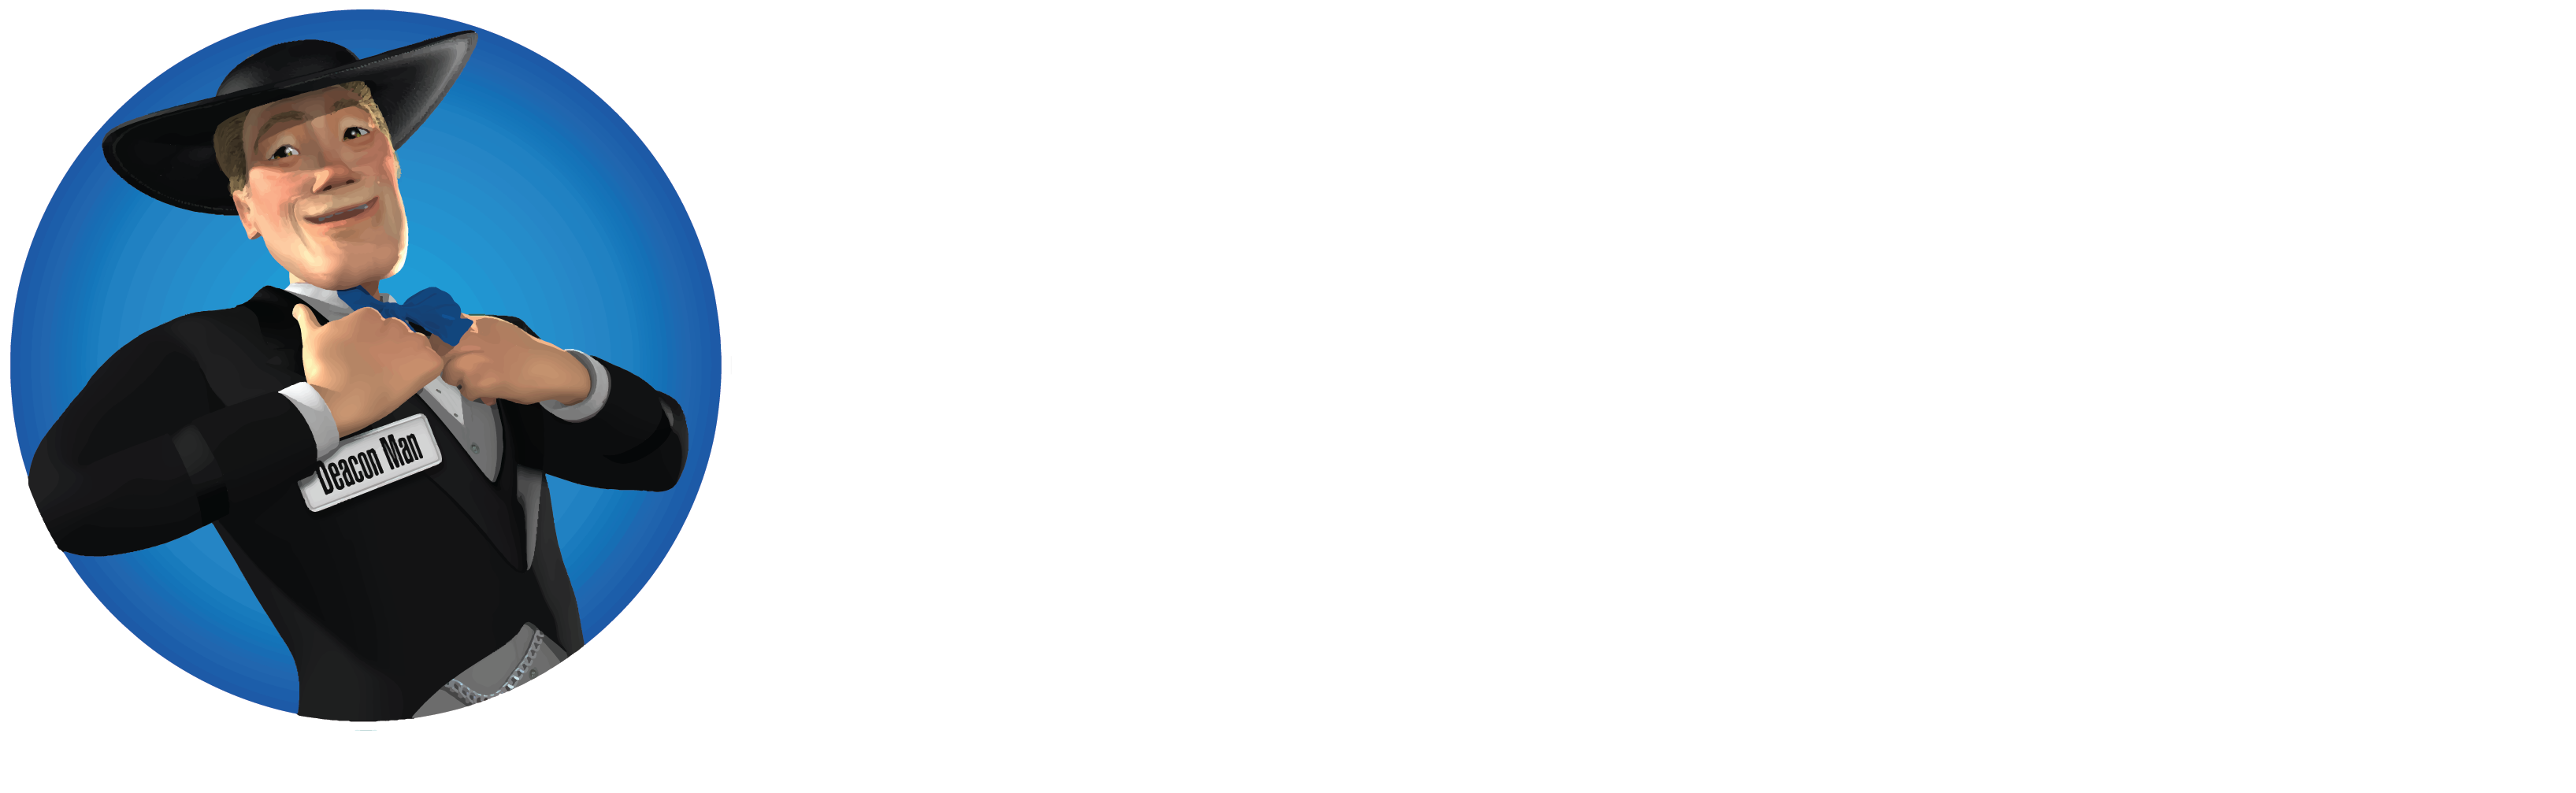 NJ_Auto_Lending_Icons-12